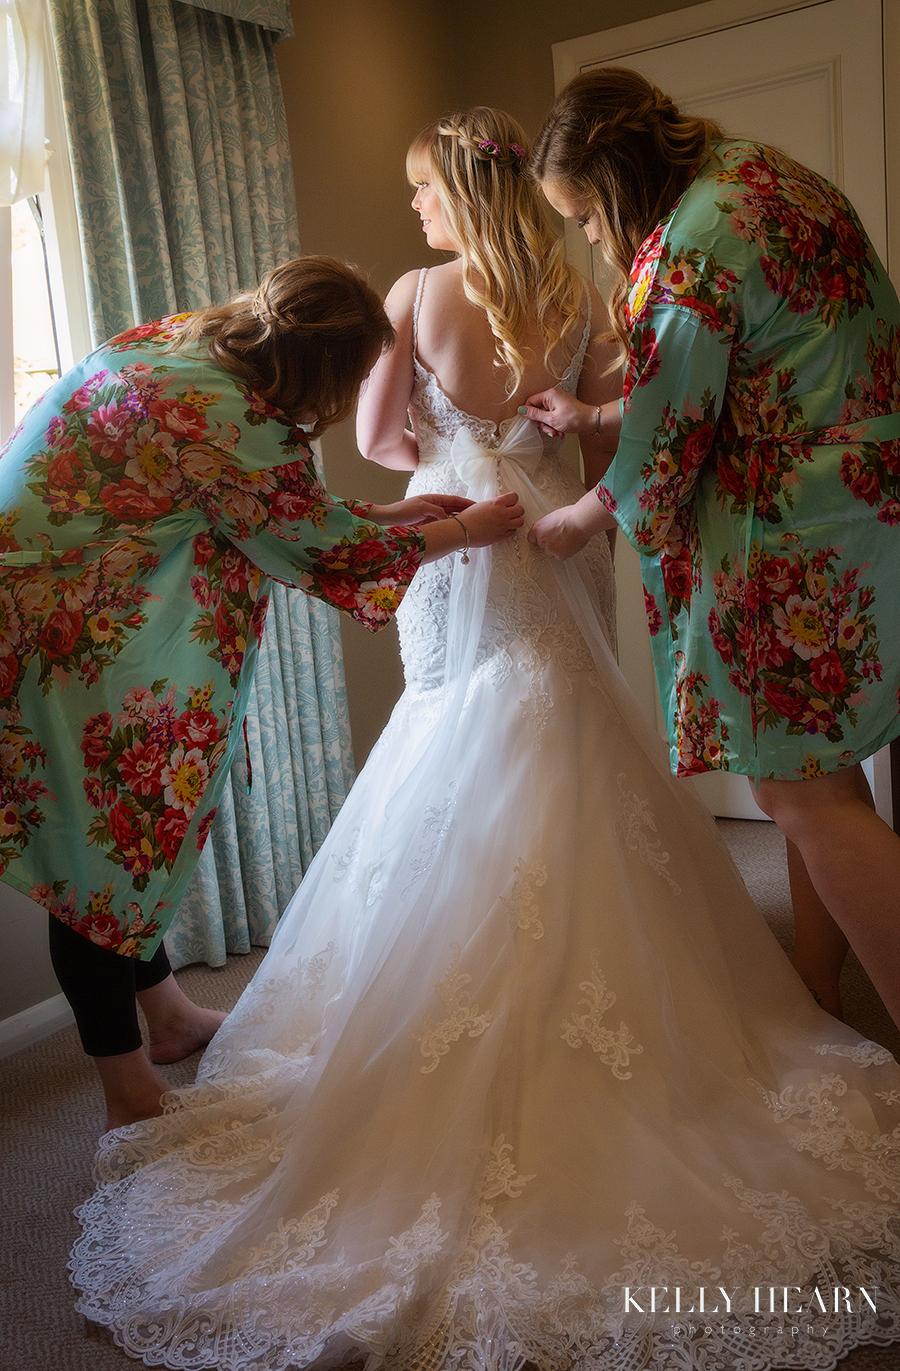 STAU_bride-putting-on-dress.jpg#asset:2498